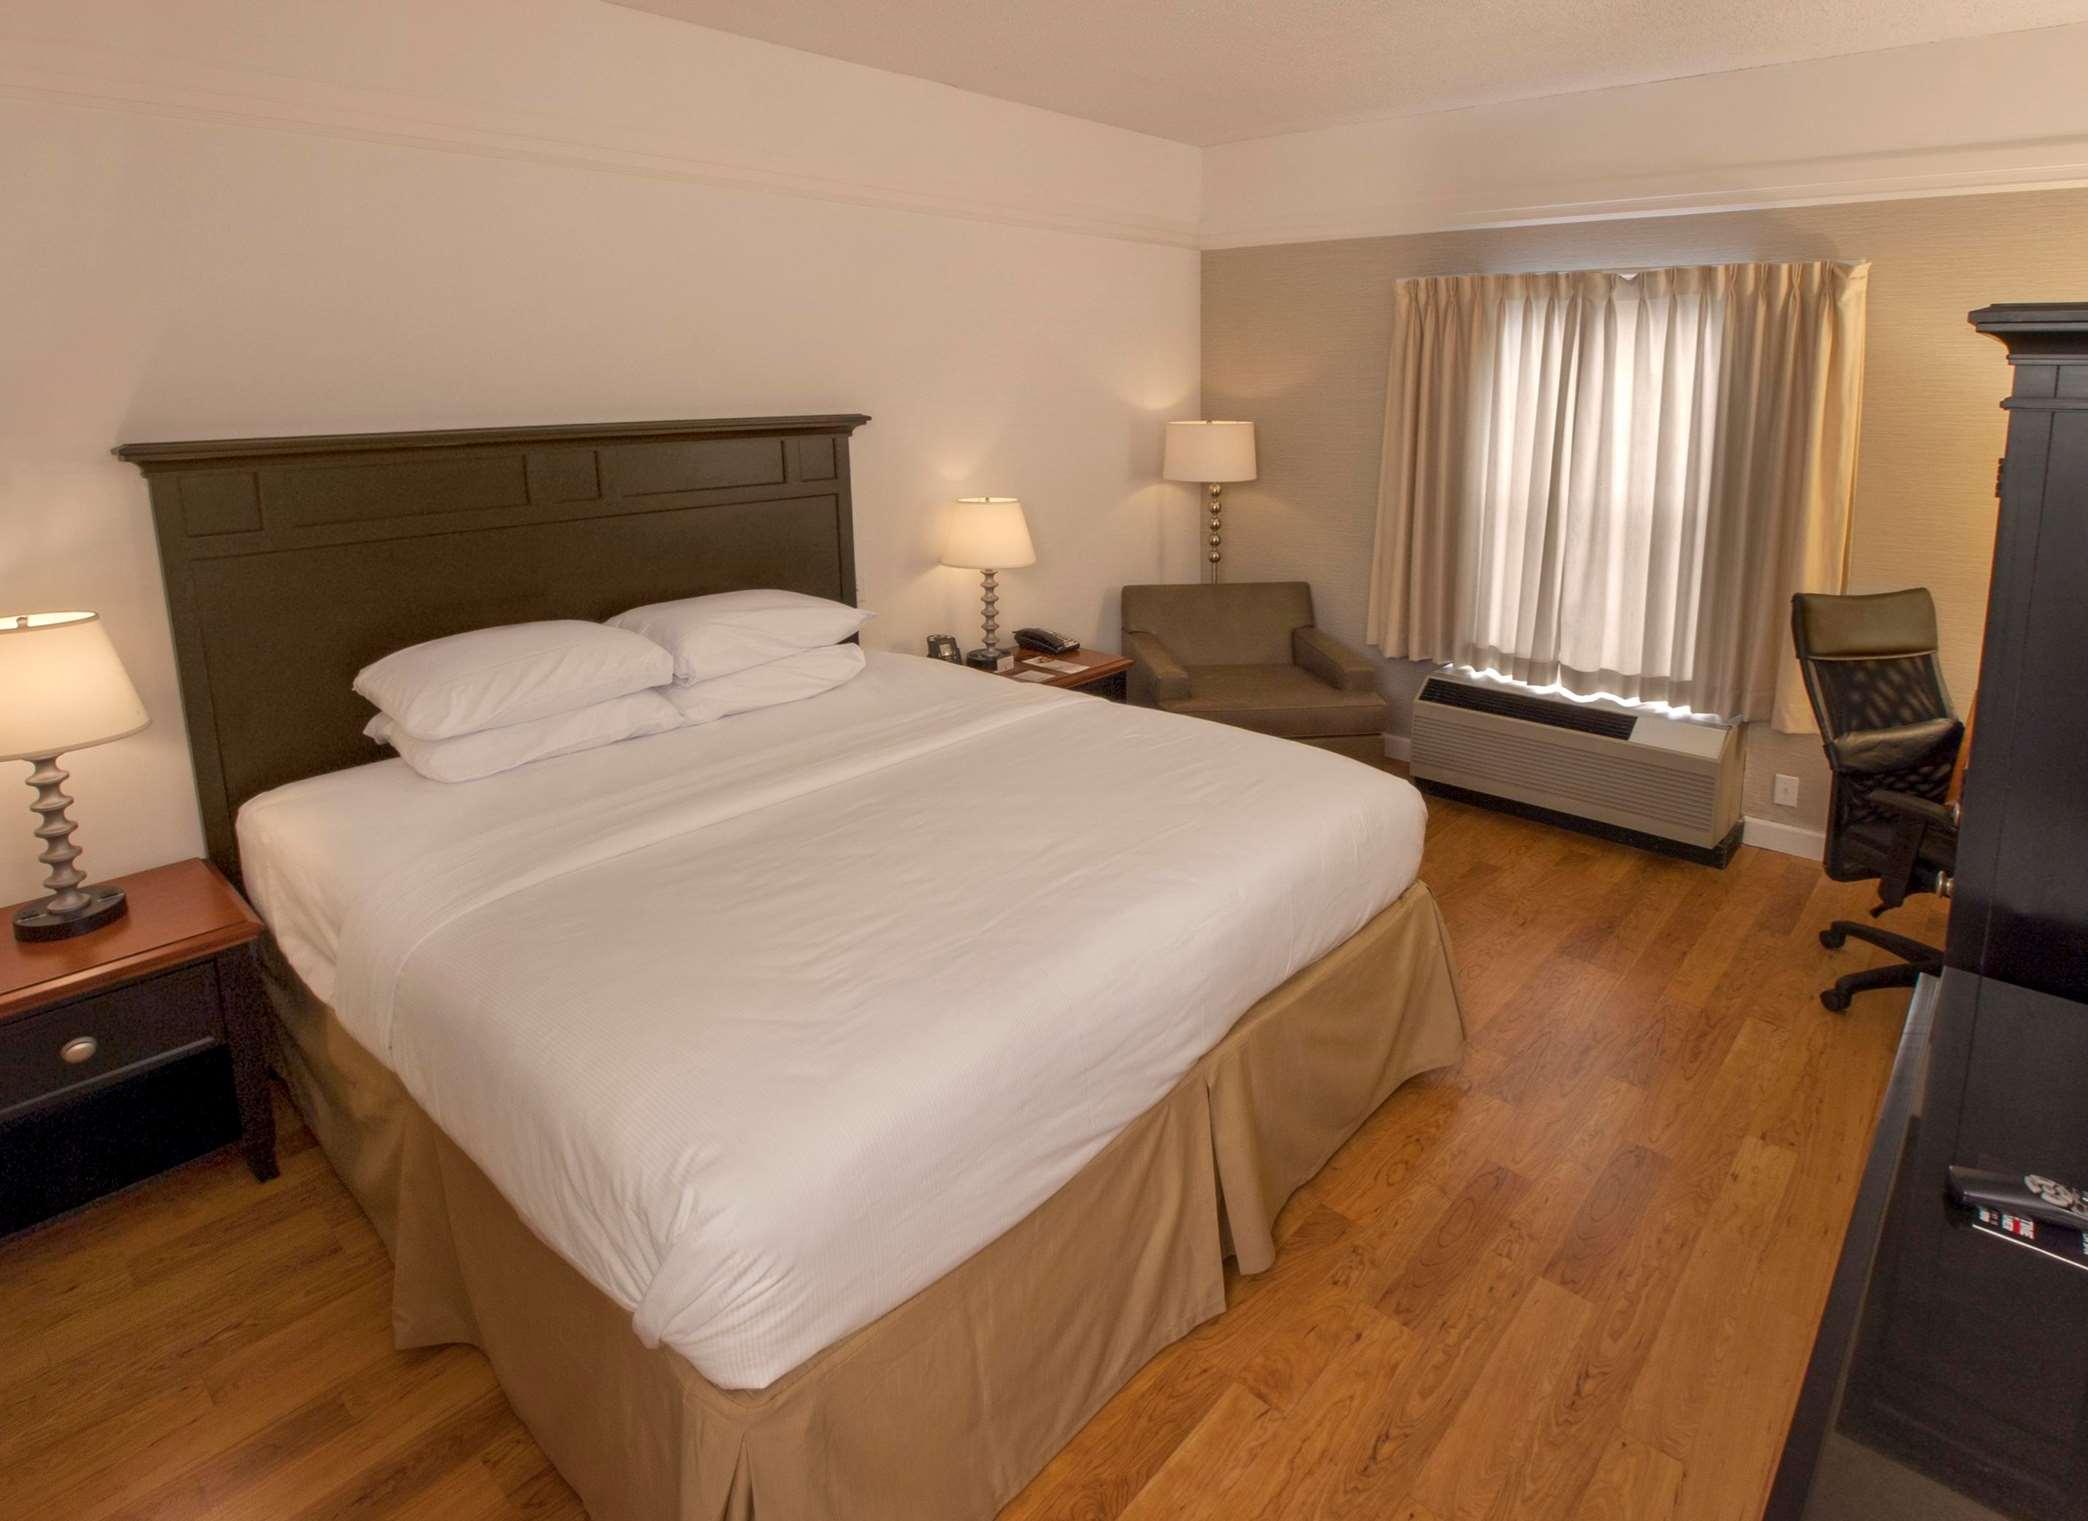 DoubleTree by Hilton Hotel Buffalo - Amherst image 16